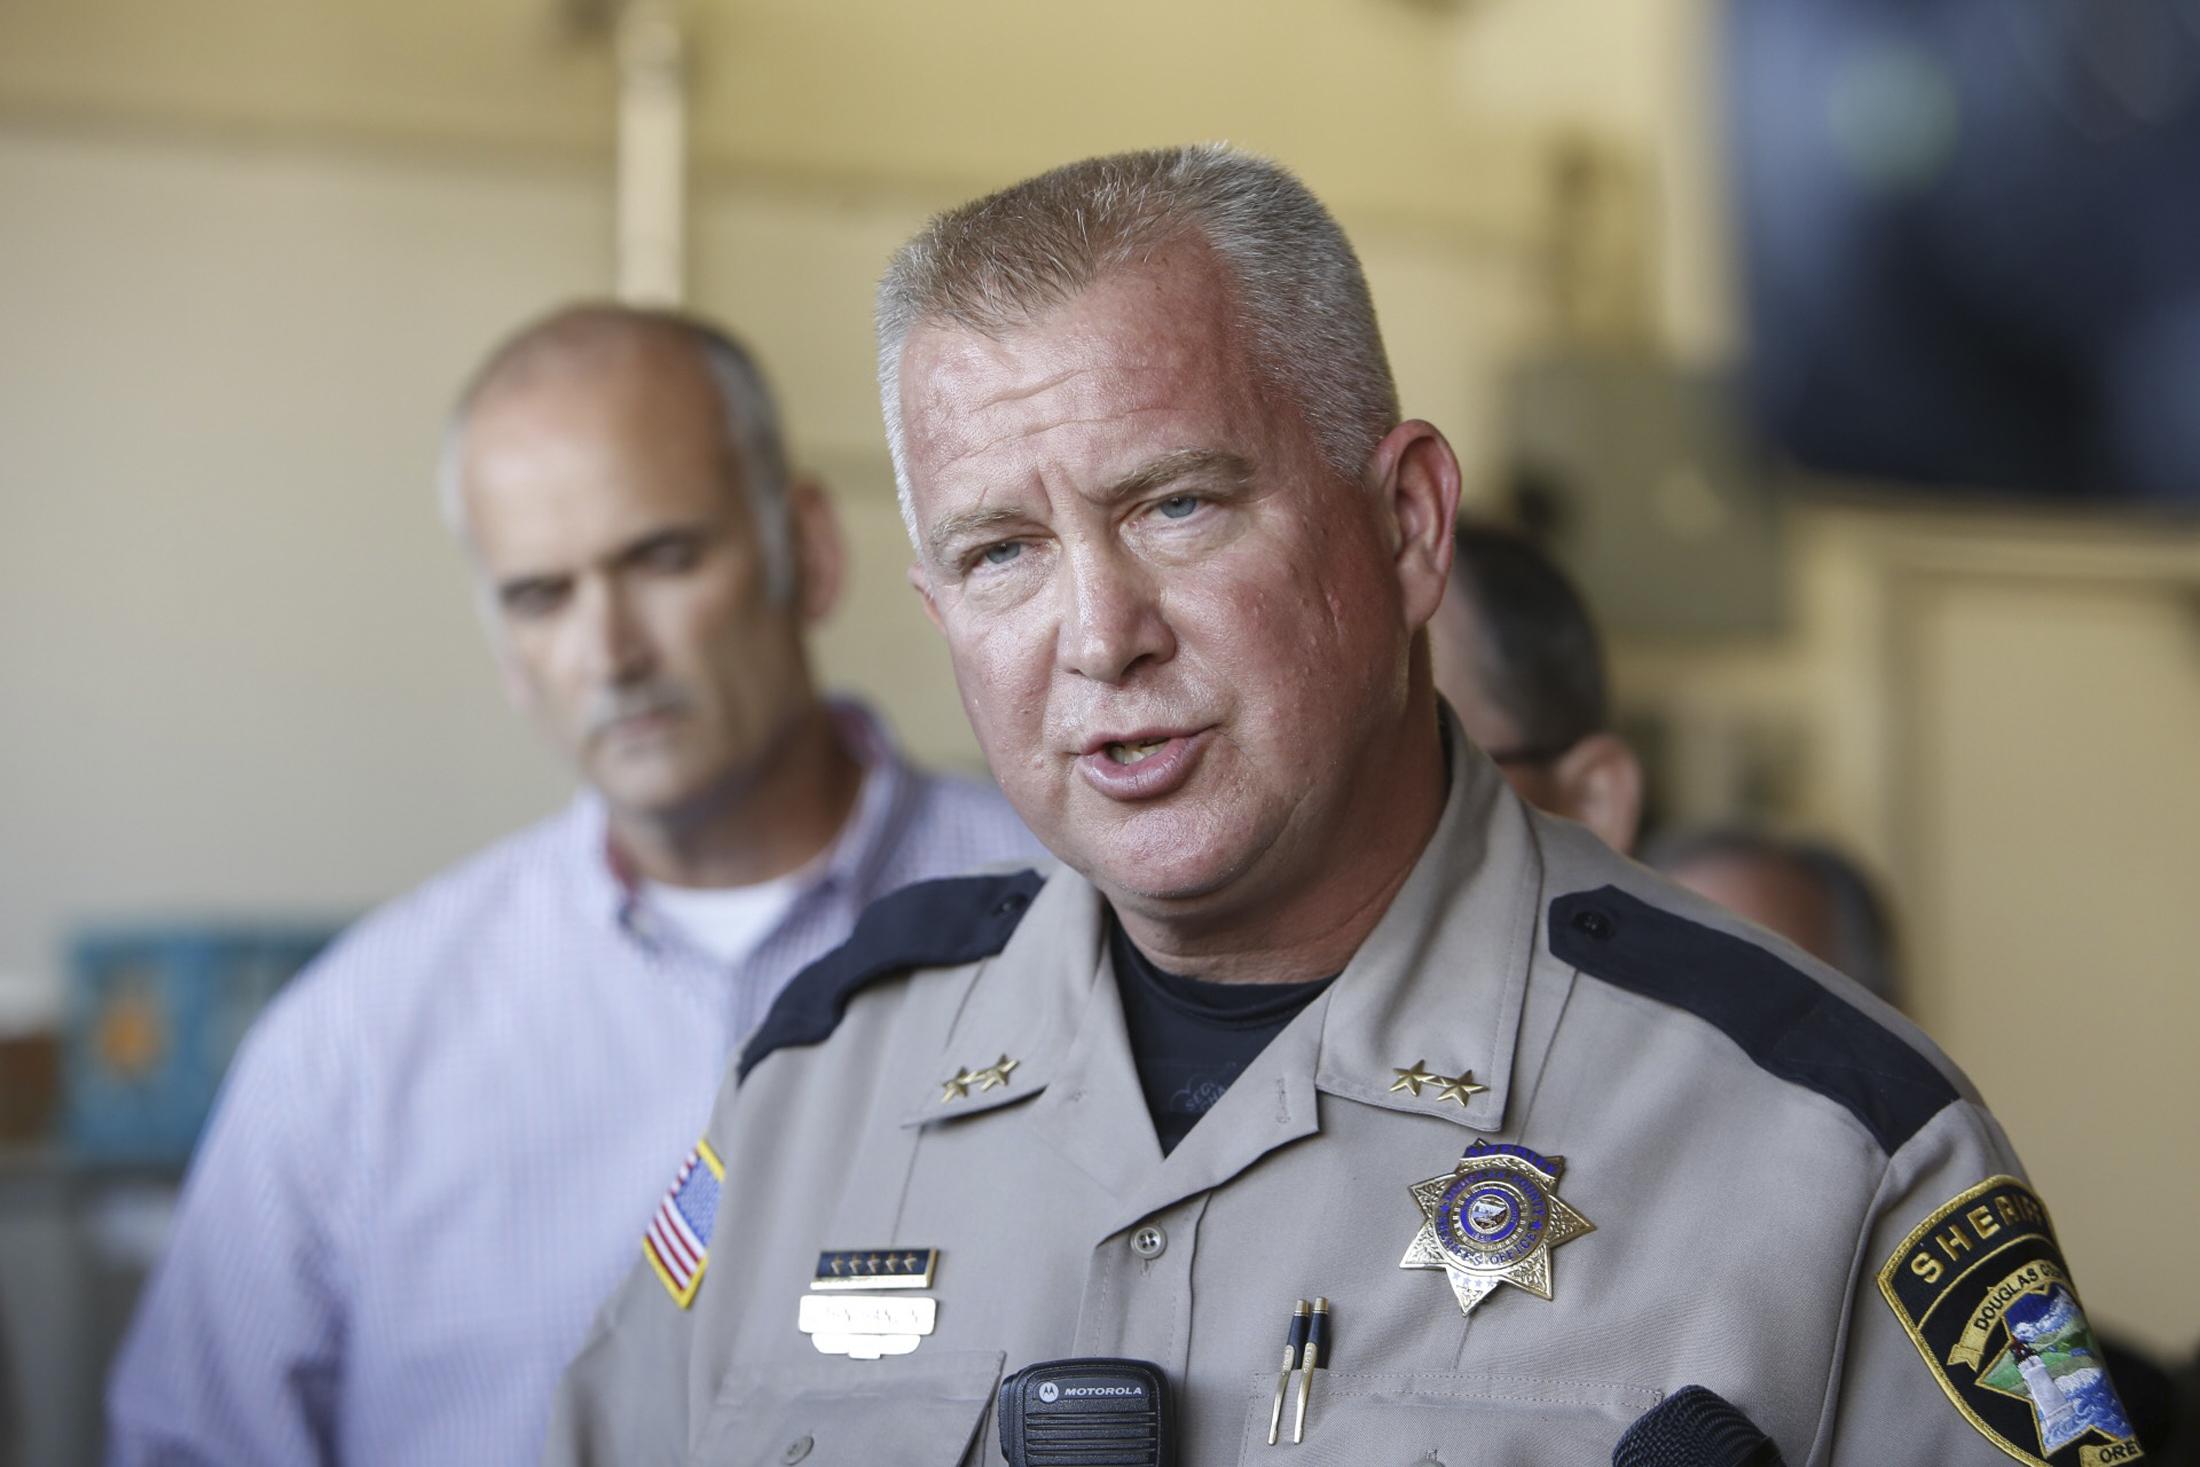 Douglas county sheriff John Hanlin speaks to media after a mass shooting at Umpqua Community College in Roseburg,Oregon October 1, 2015.